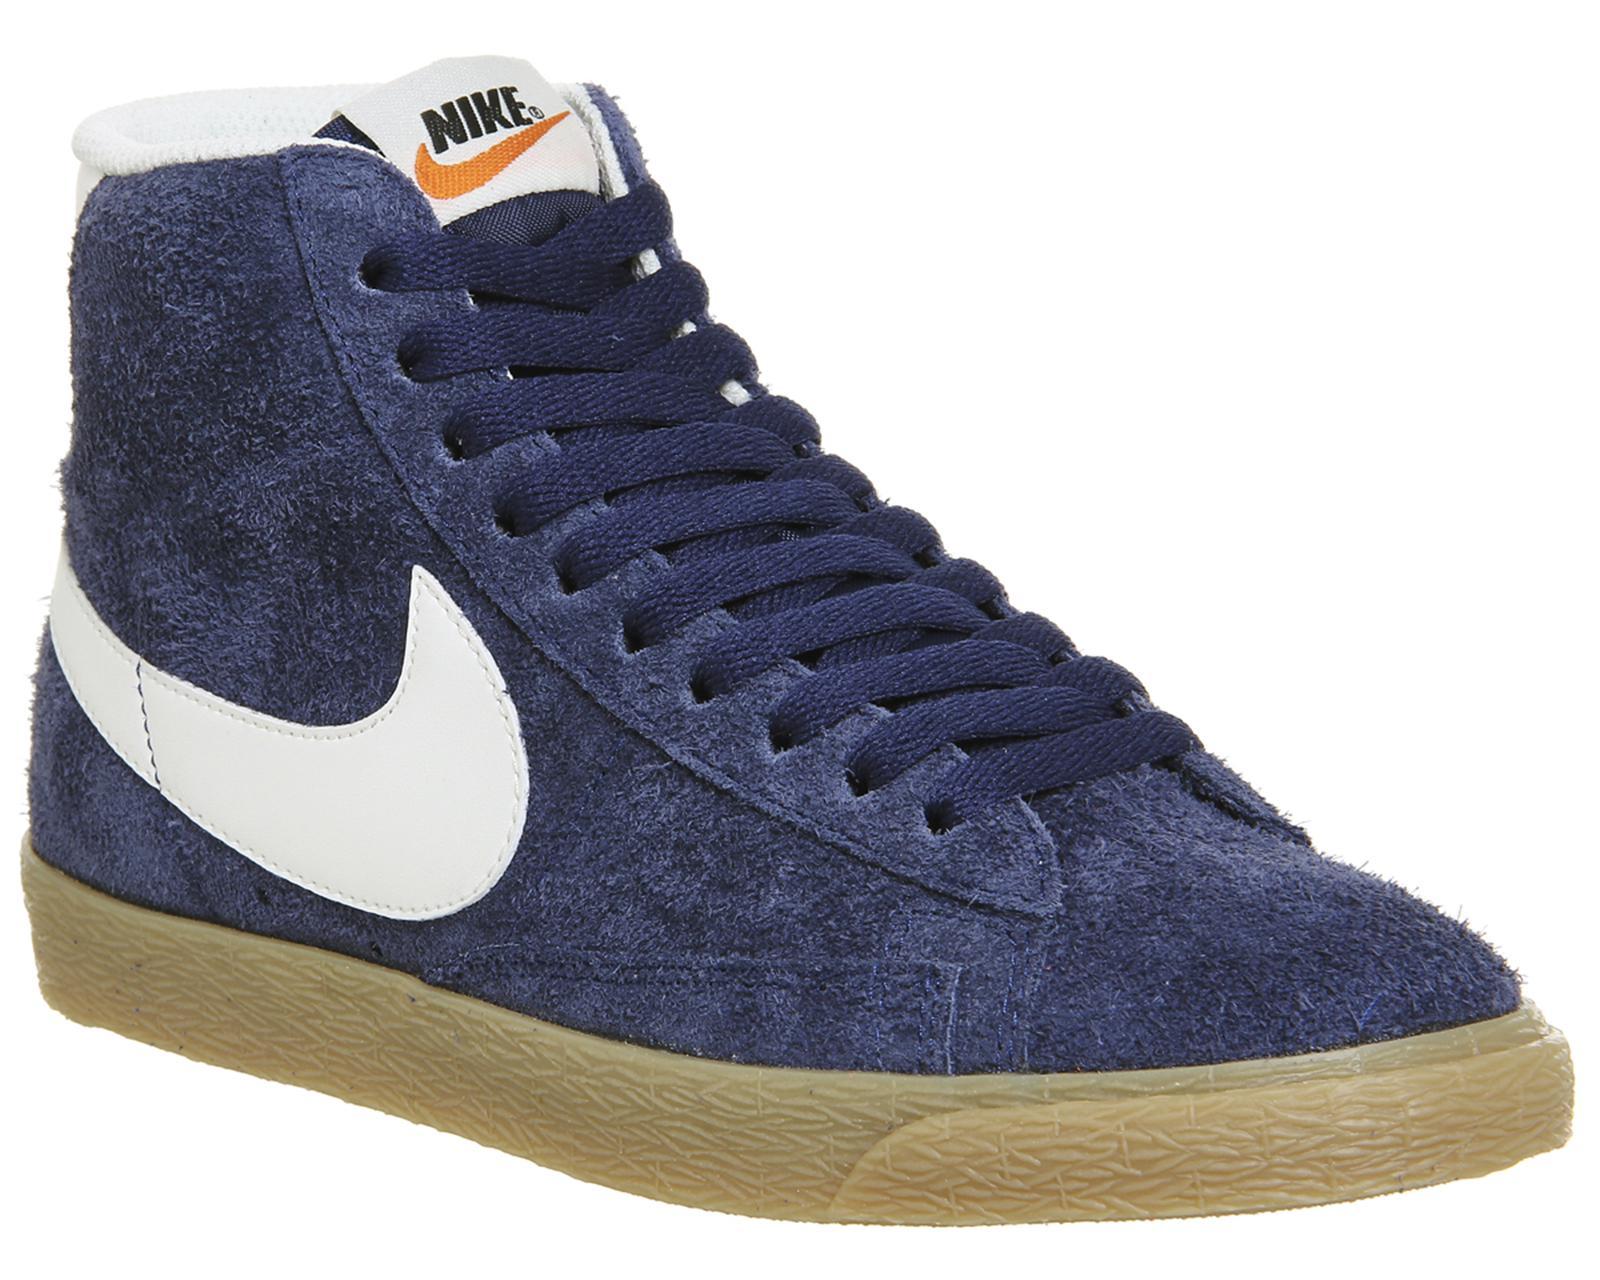 Nike Blazer Mid In Blue For Men - Lyst